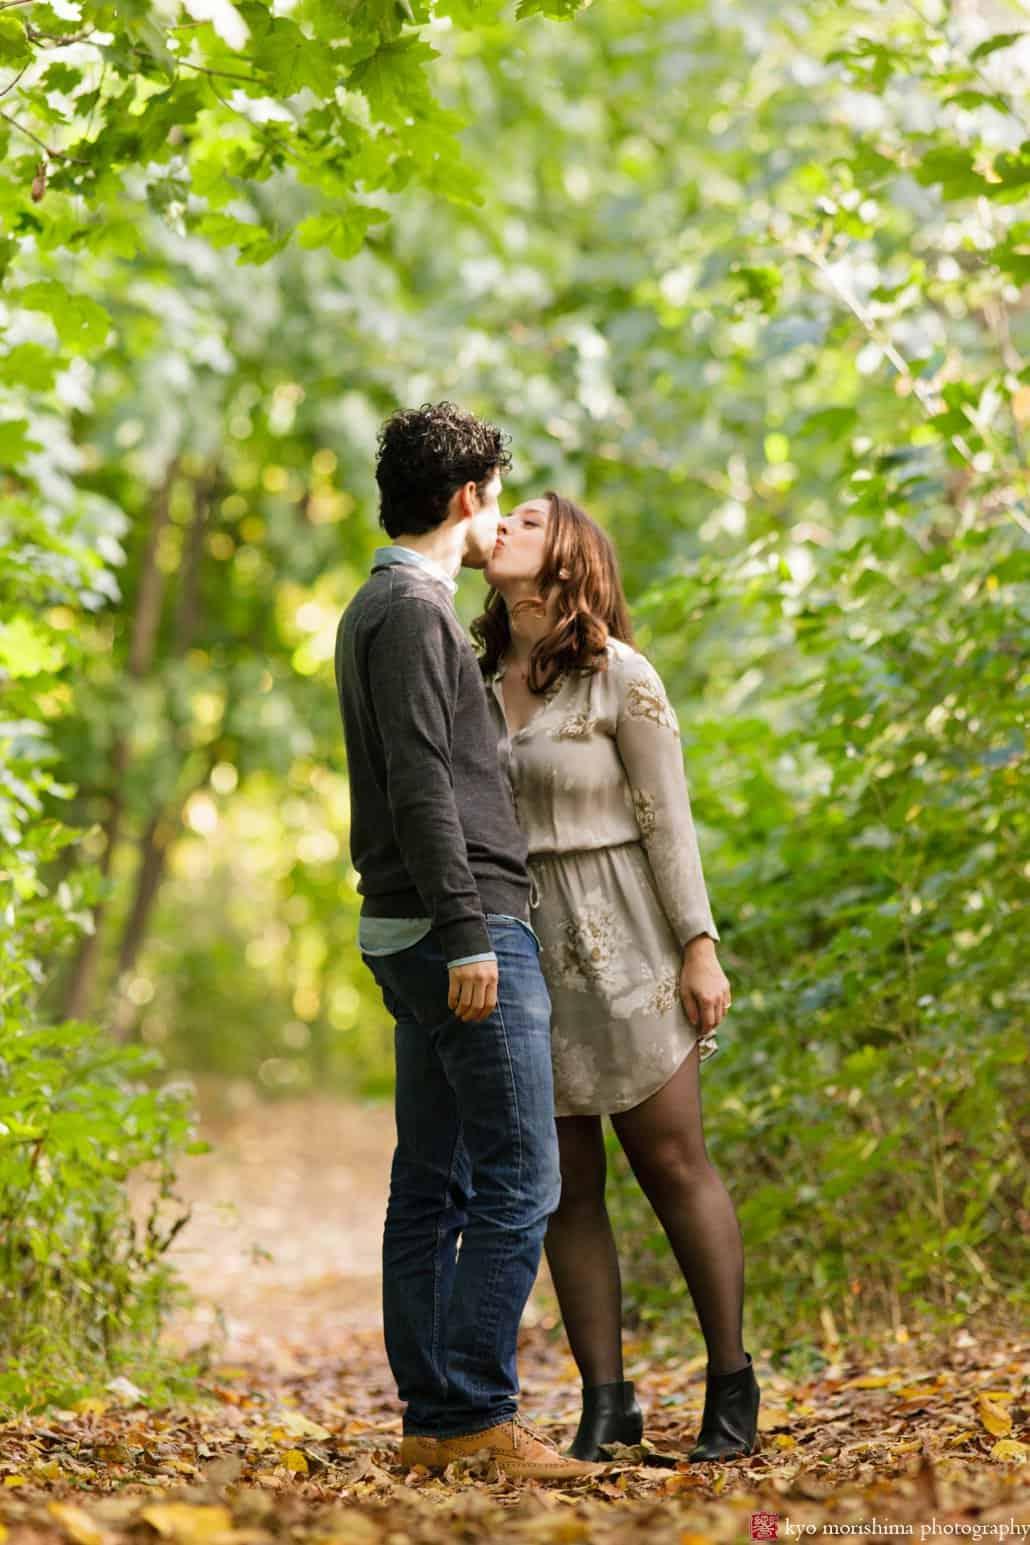 Prospect Park engagement photo kiss photographed by Kyo Morishima